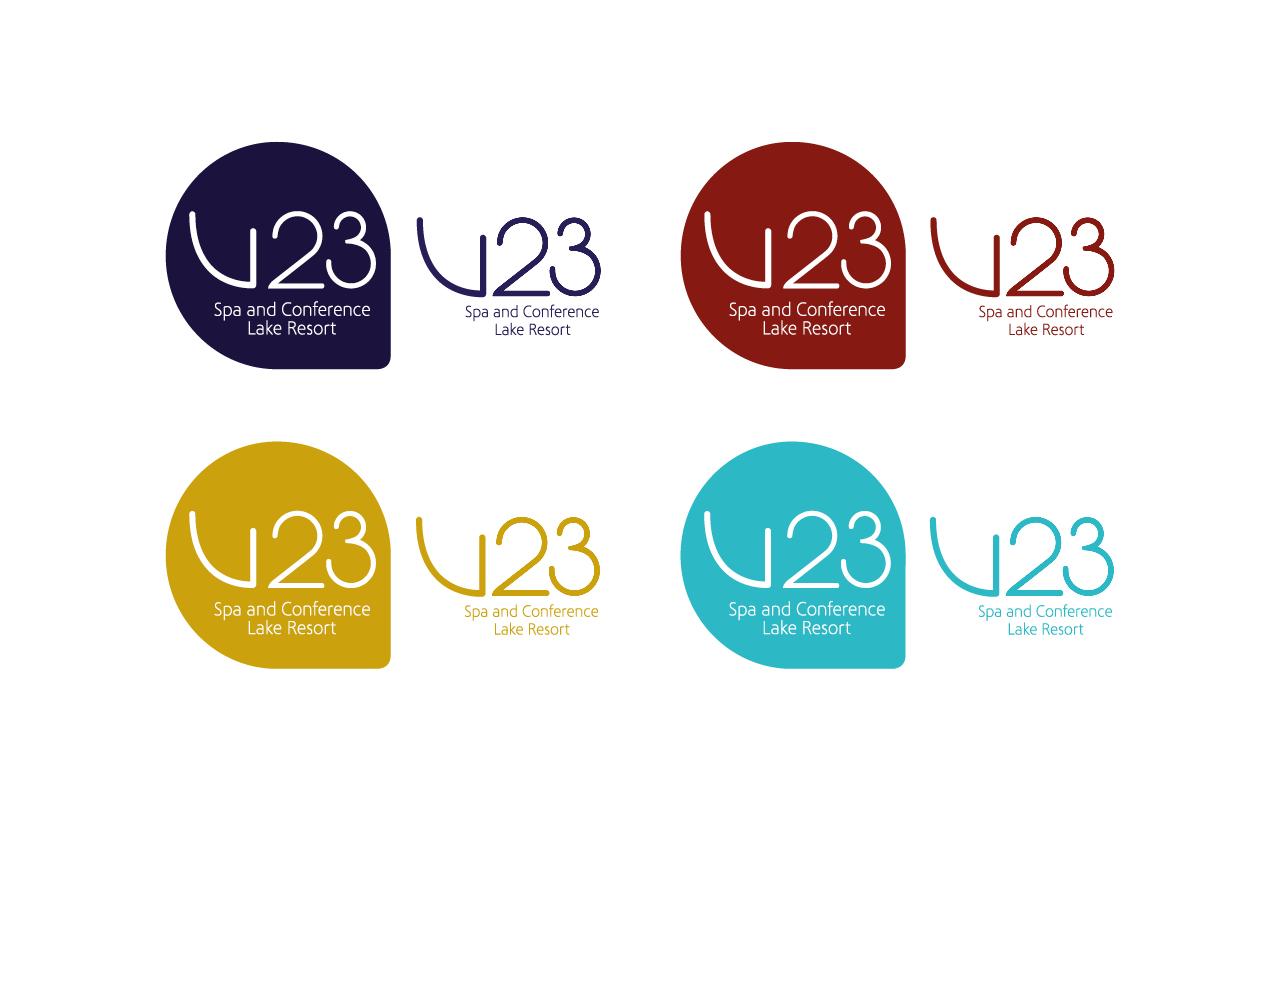 Caroline-Rismont_Vila23-Sub-Logos